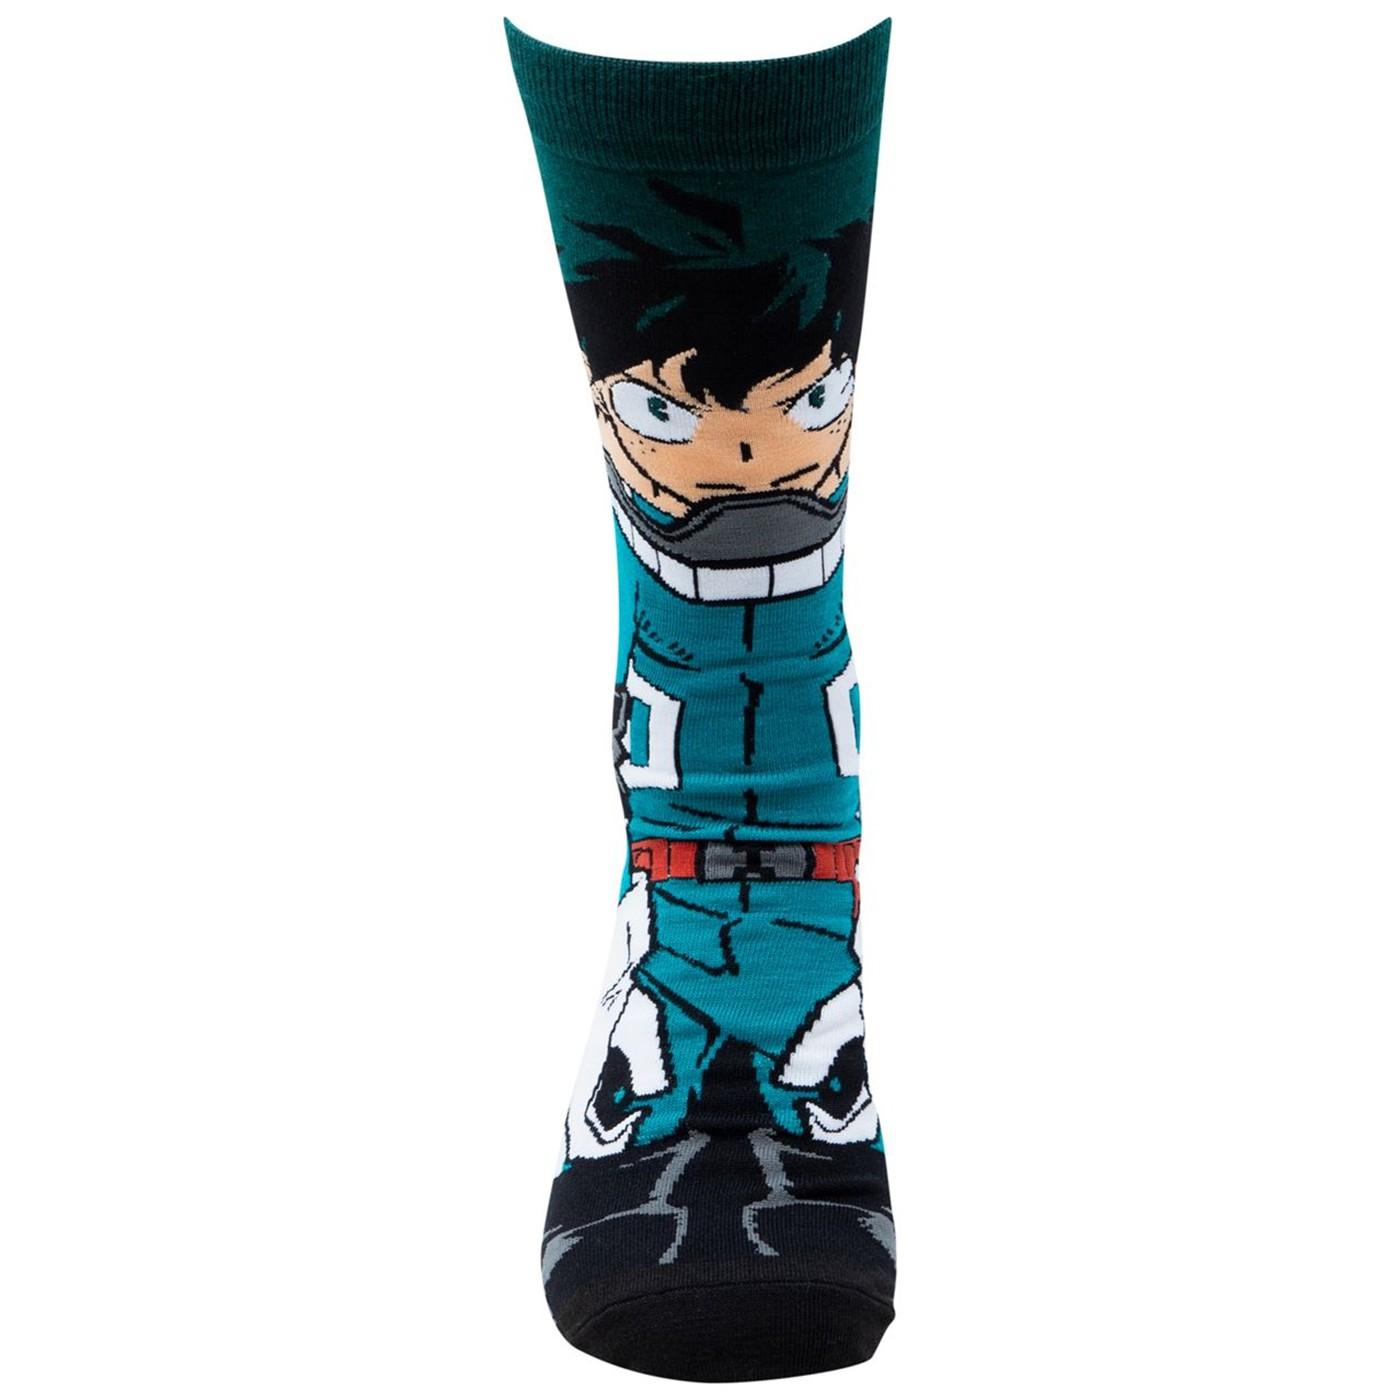 My Hero Academia Izuku 360 Character Socks